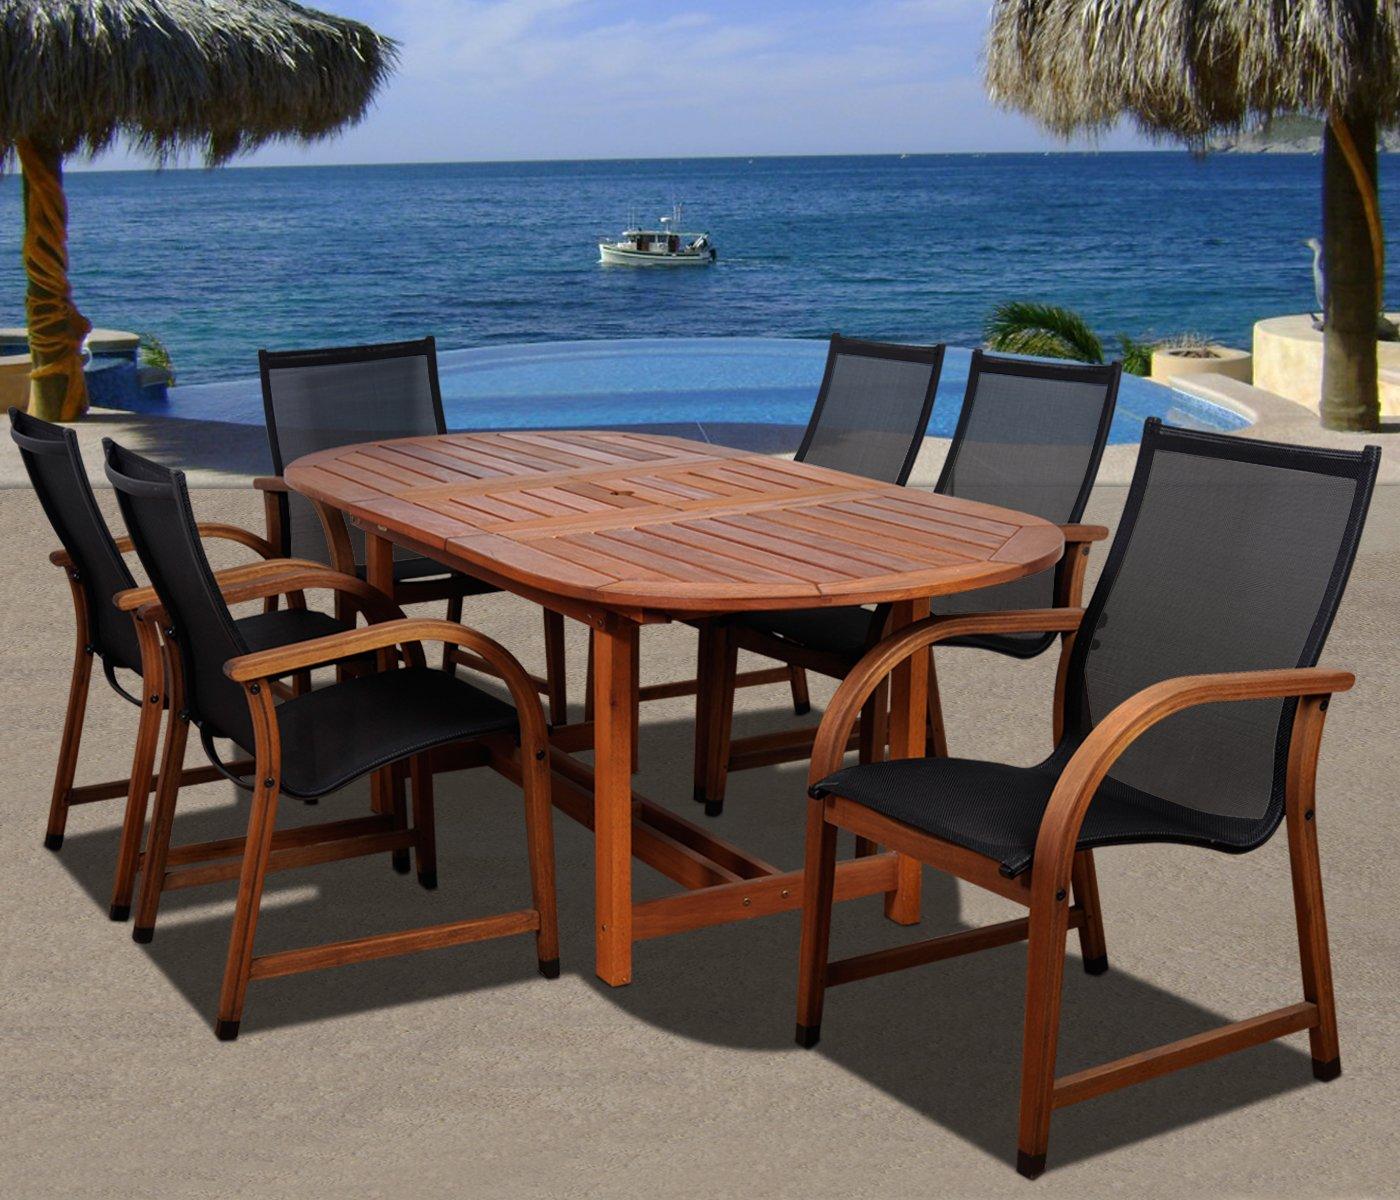 Amazon.com : Amazonia Bahamas 7 Piece Eucalyptus Oval Dining Set : Patio  Dining Chairs : Patio, Lawn U0026 Garden